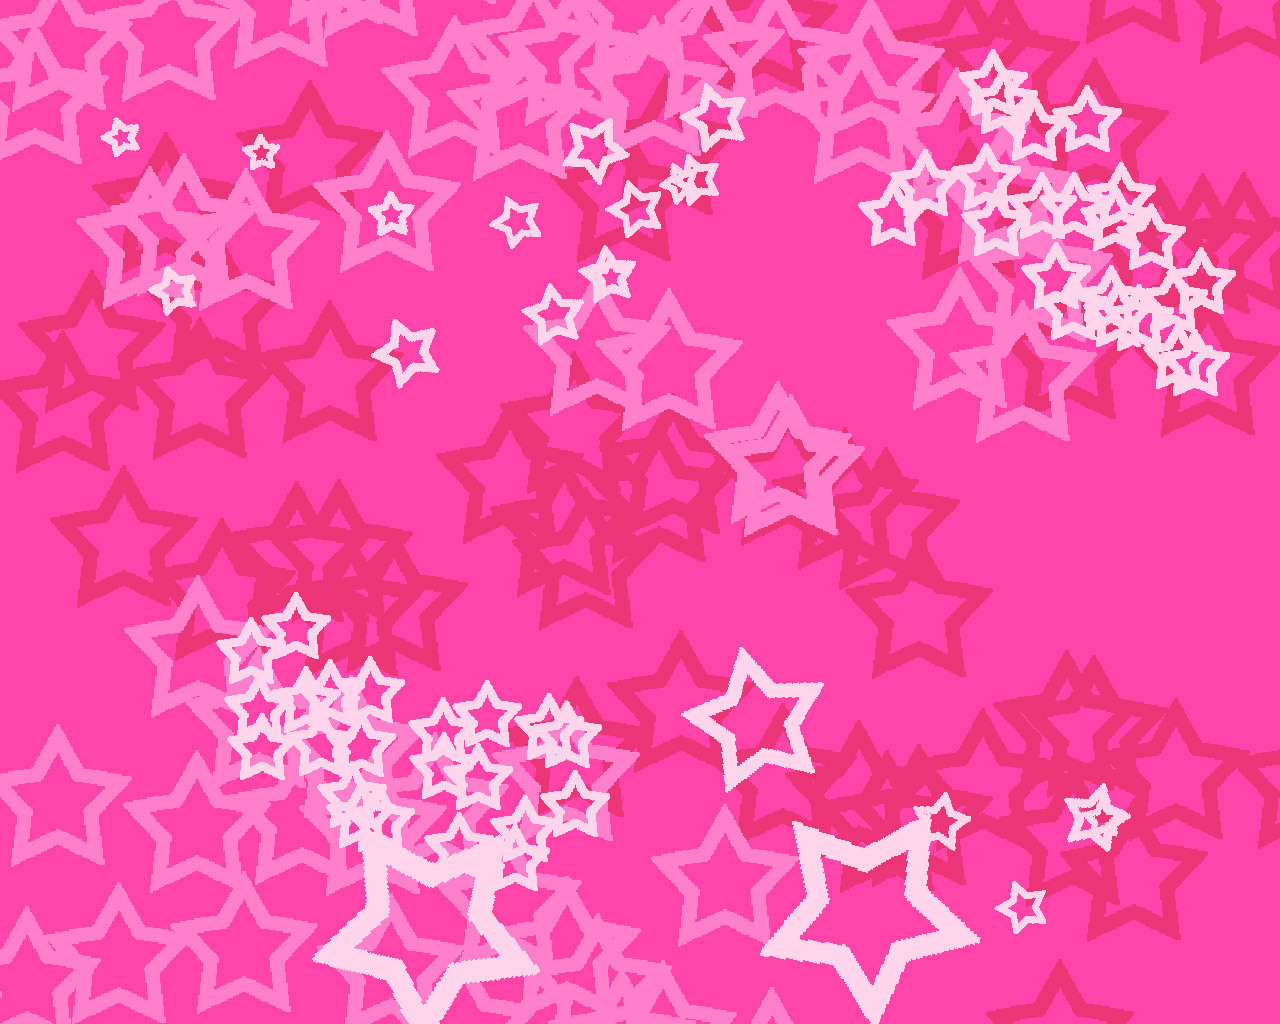 Pink wallpaper   Pink Color Wallpaper 10579418 1280x1024